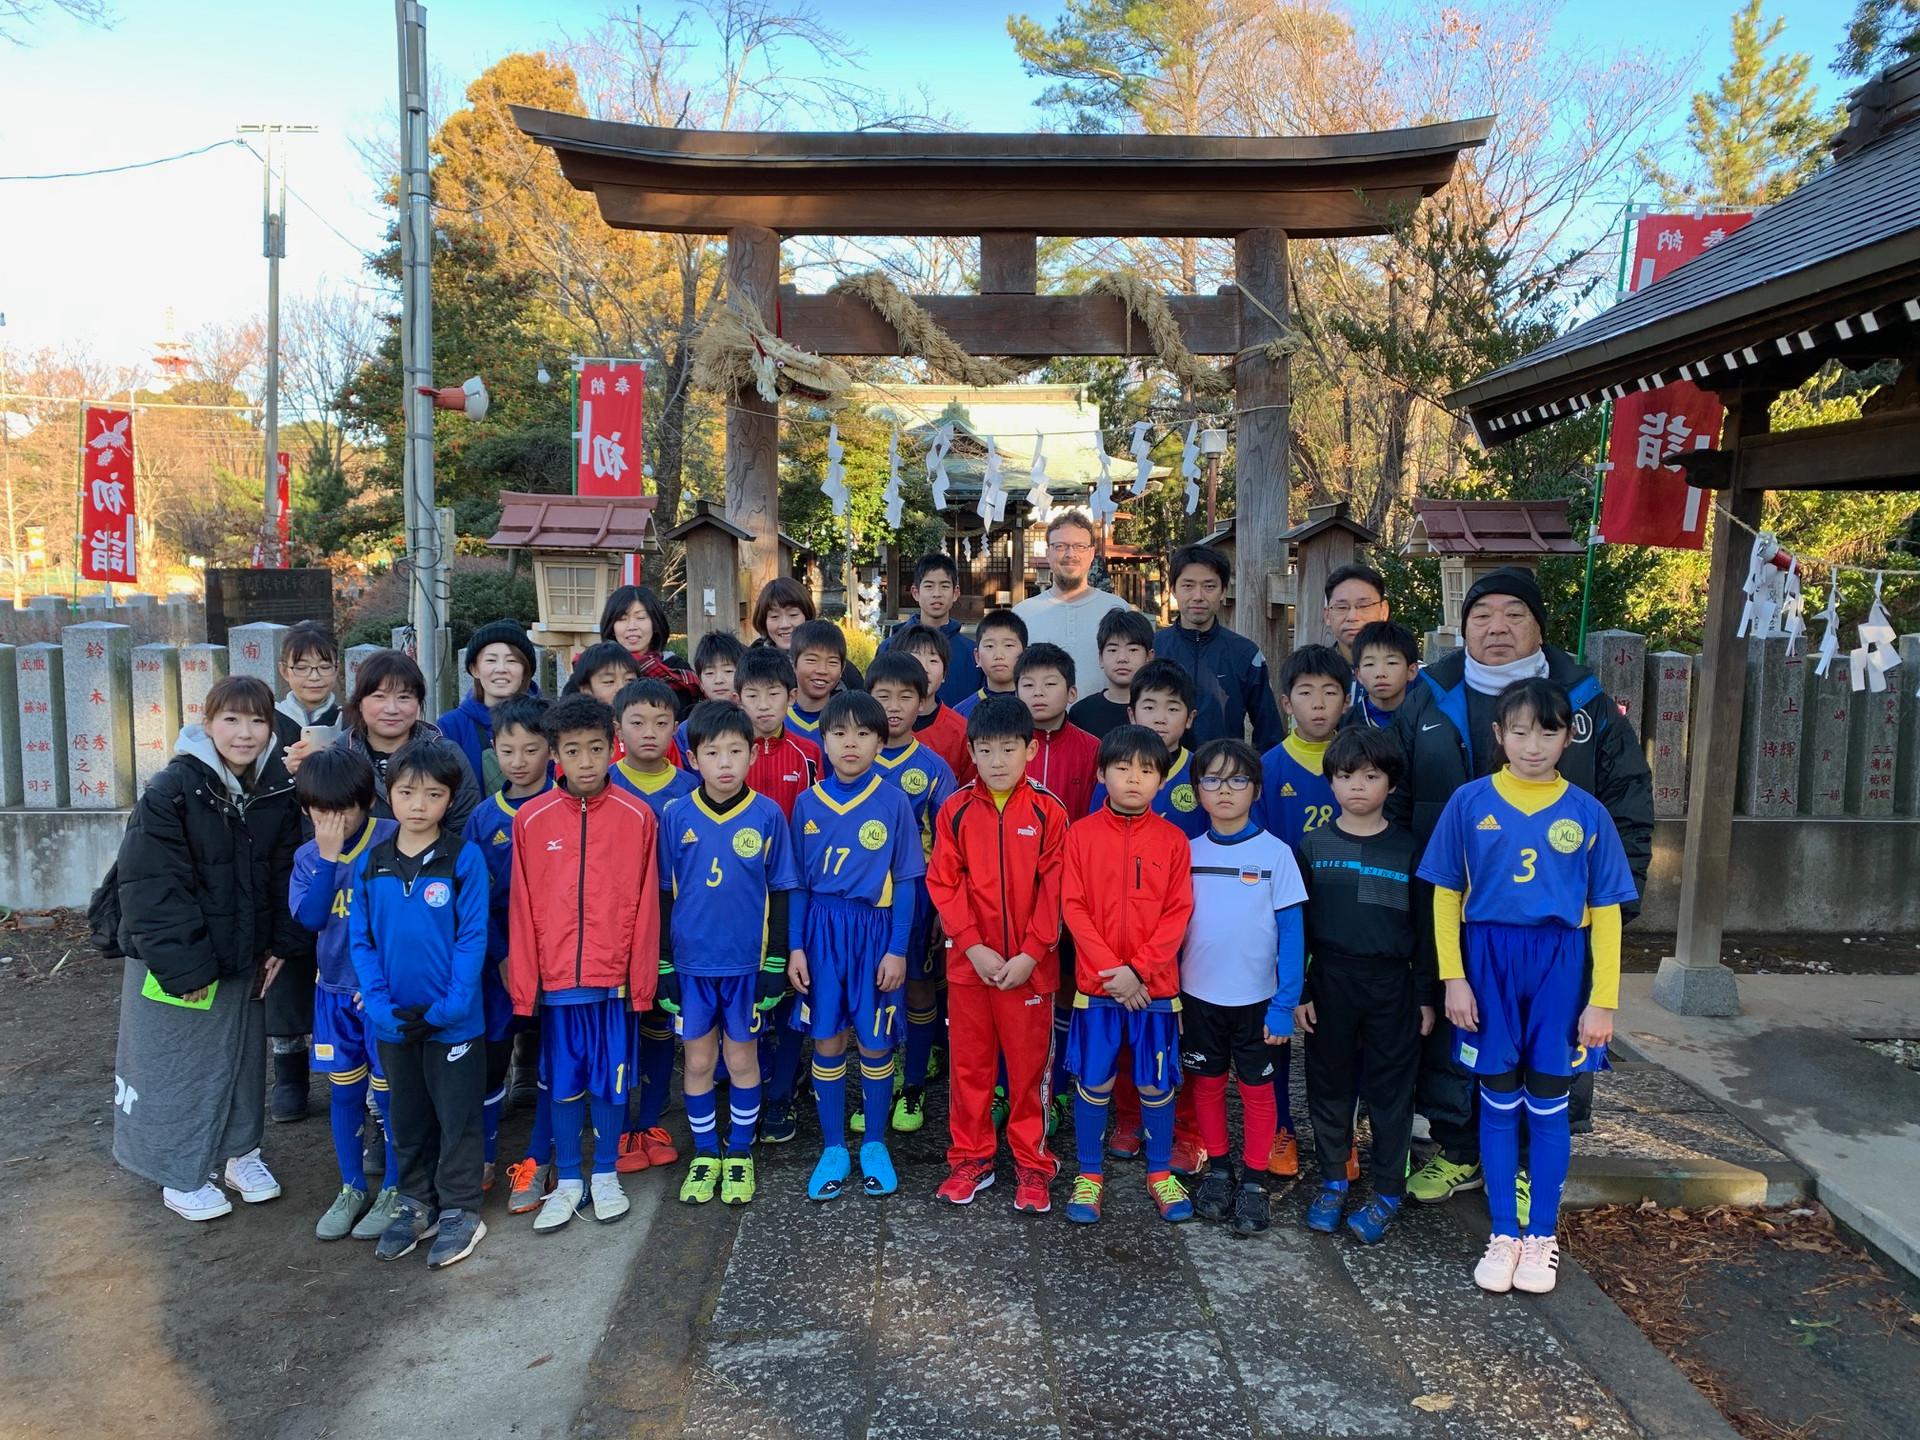 2020年 初蹴り熊野神社